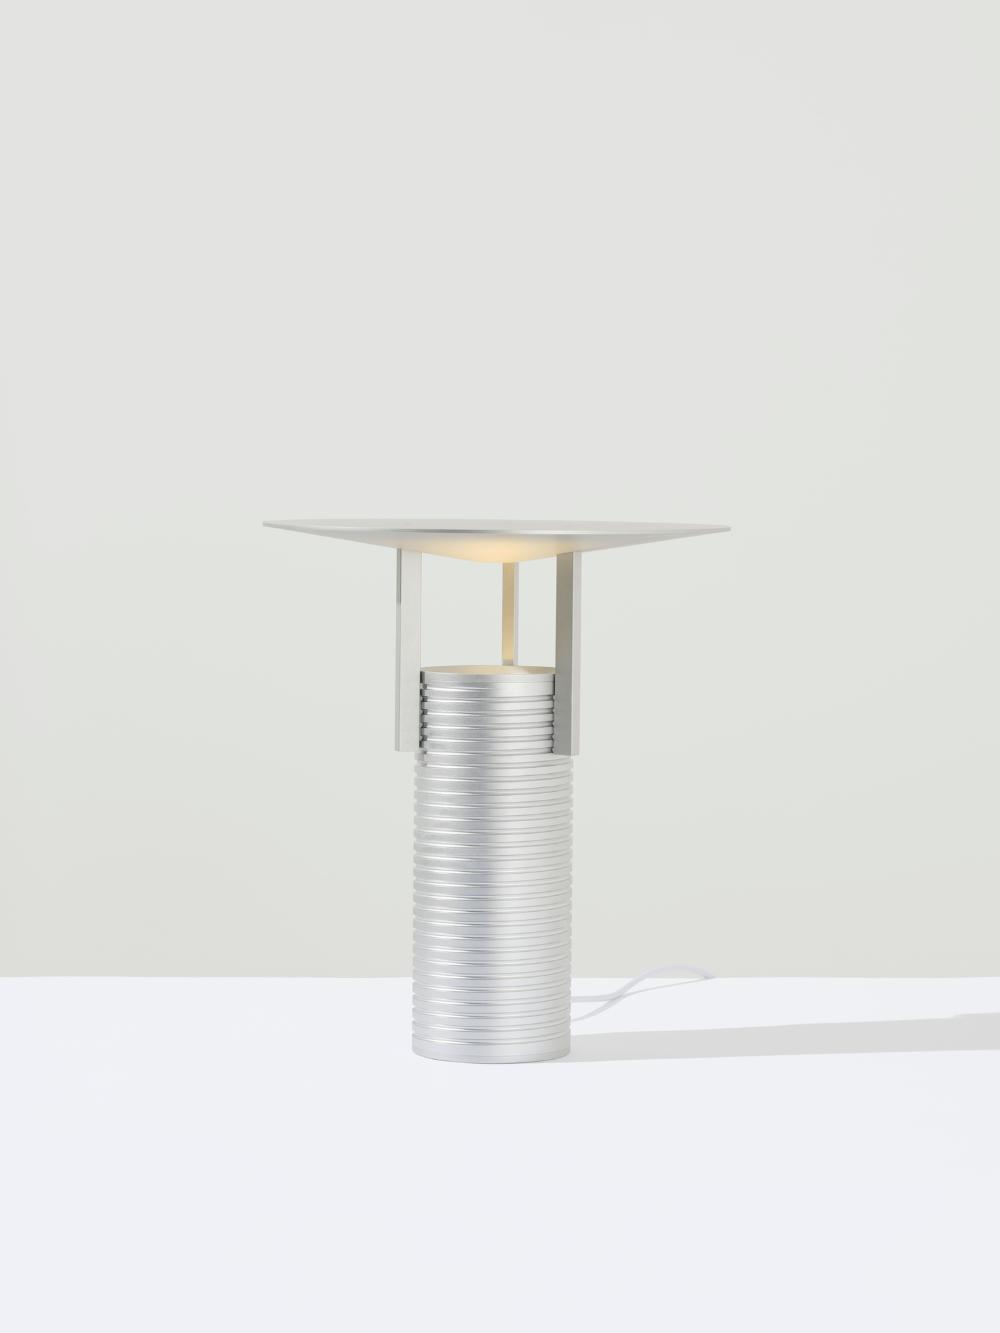 Thread Lamp 2020 이미지 포함